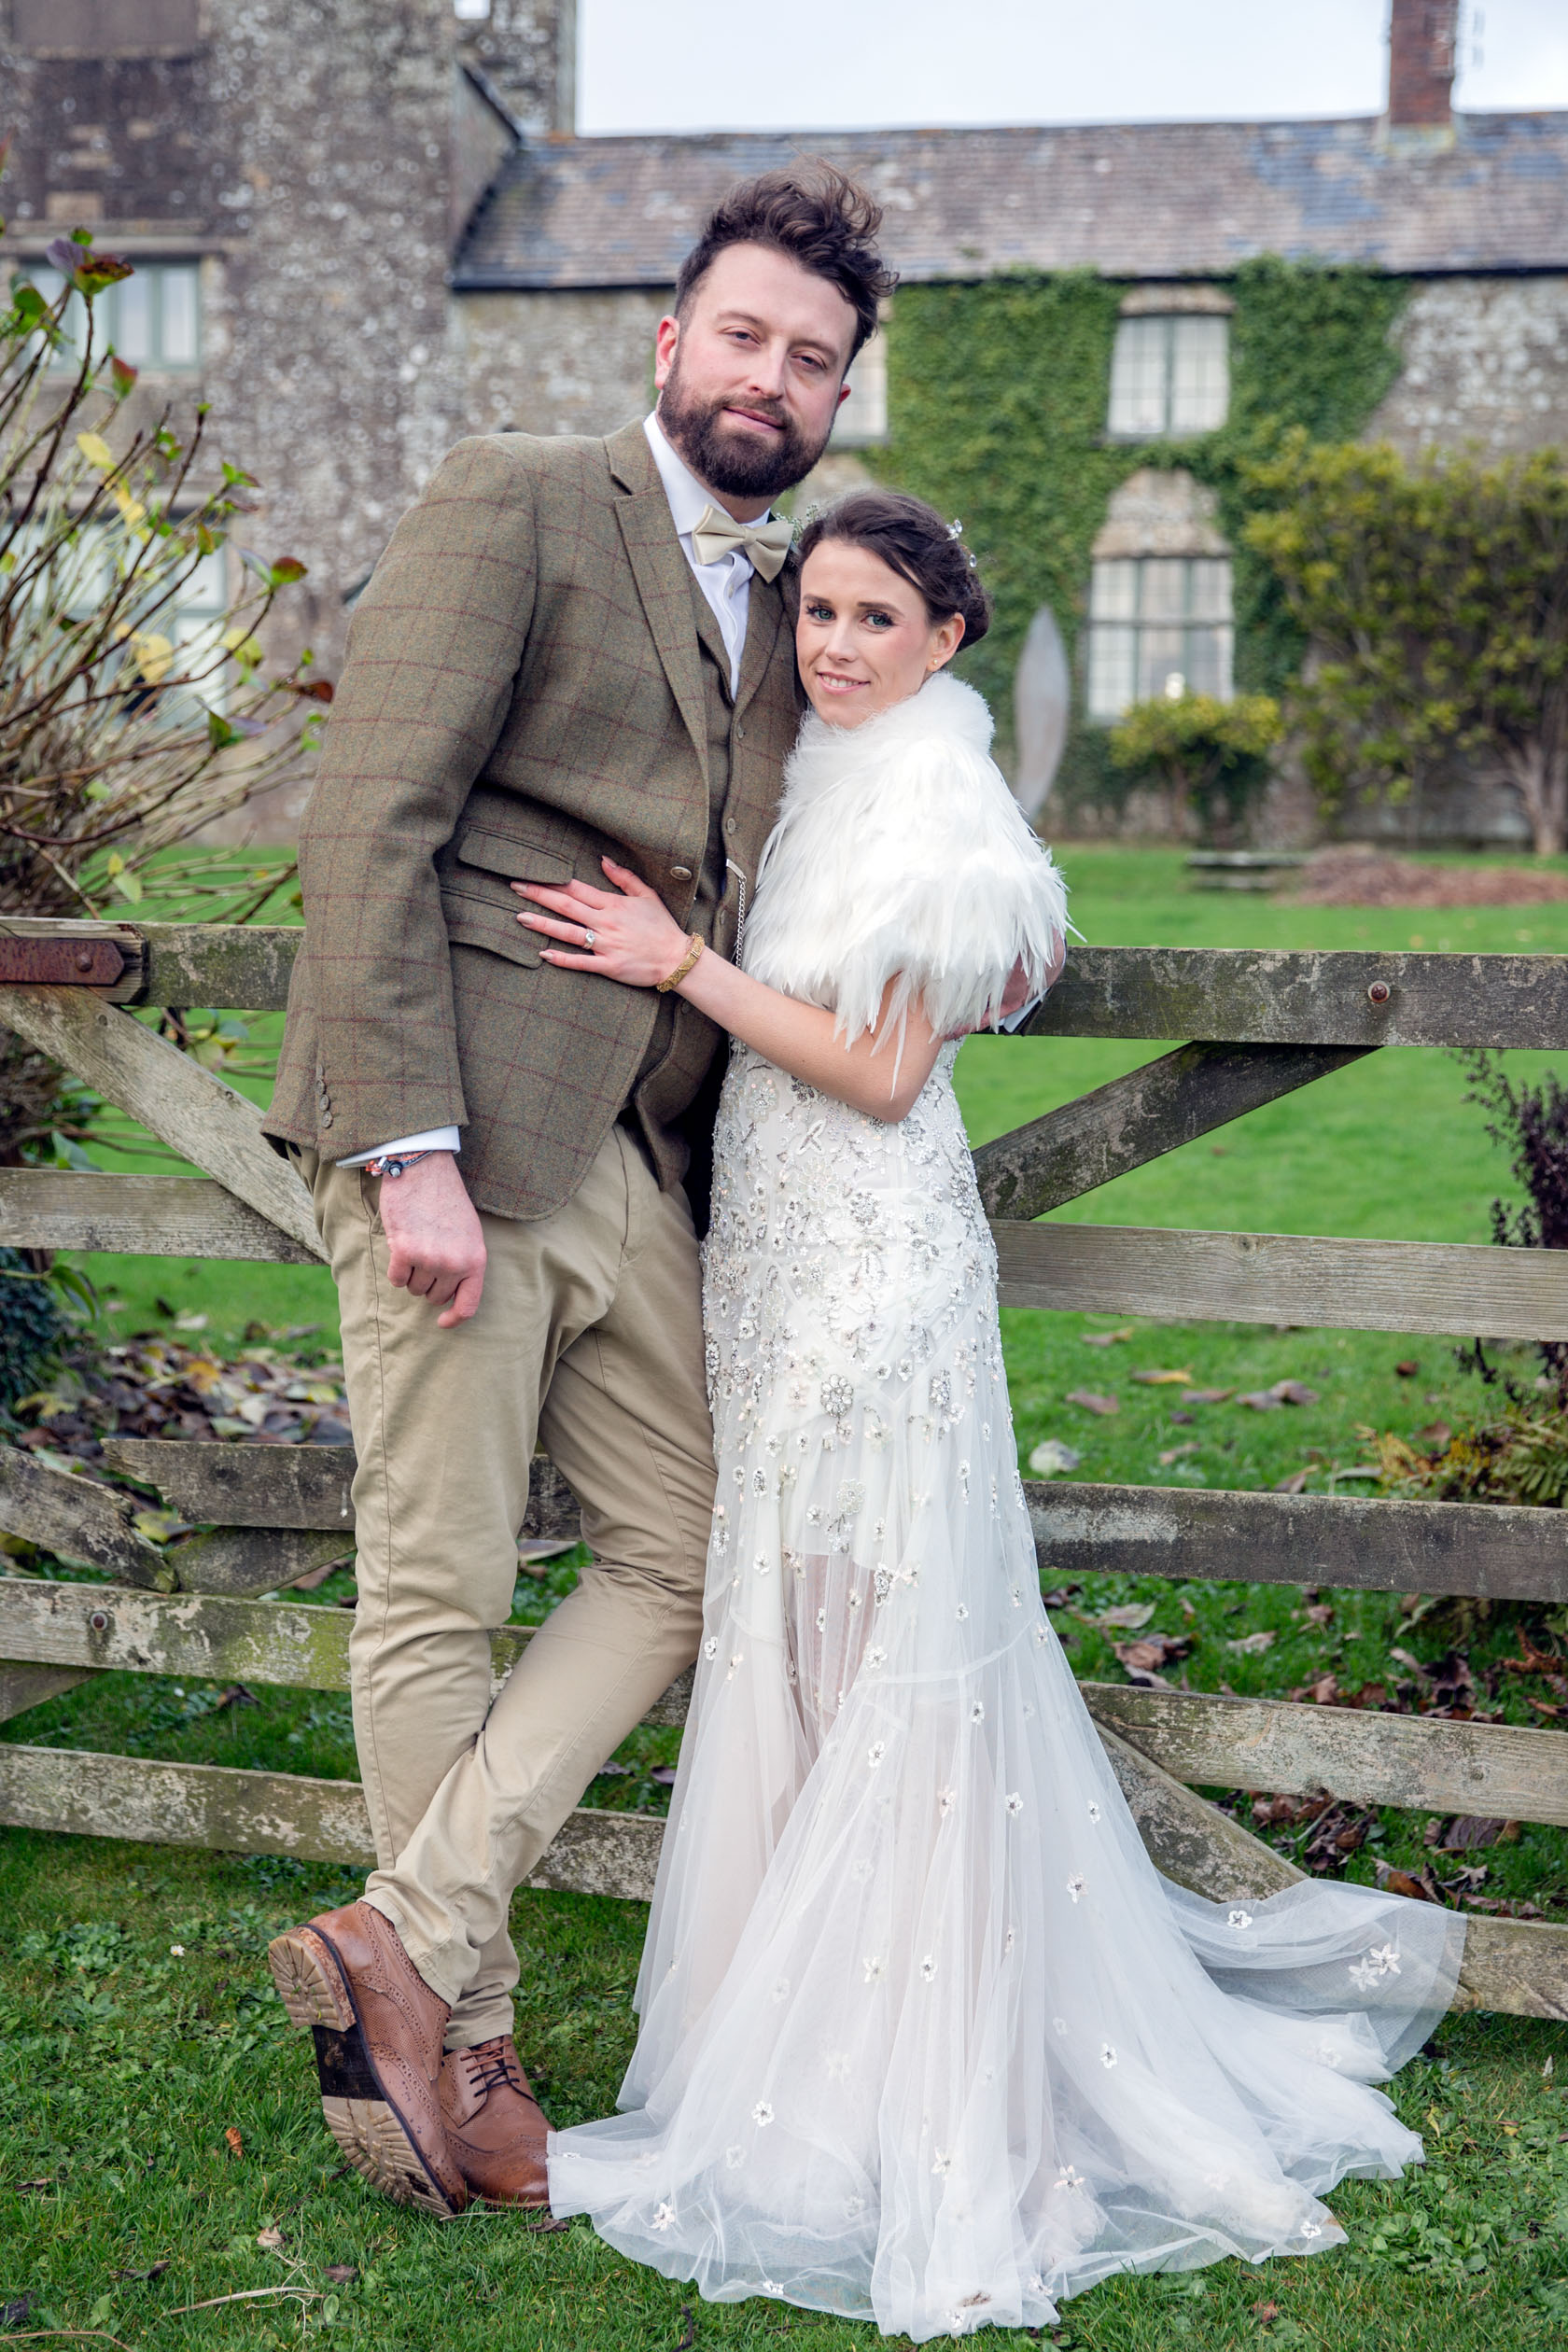 Jess & Ben - Bristol Wedding Photographer - Wright Wedding Photography - 117